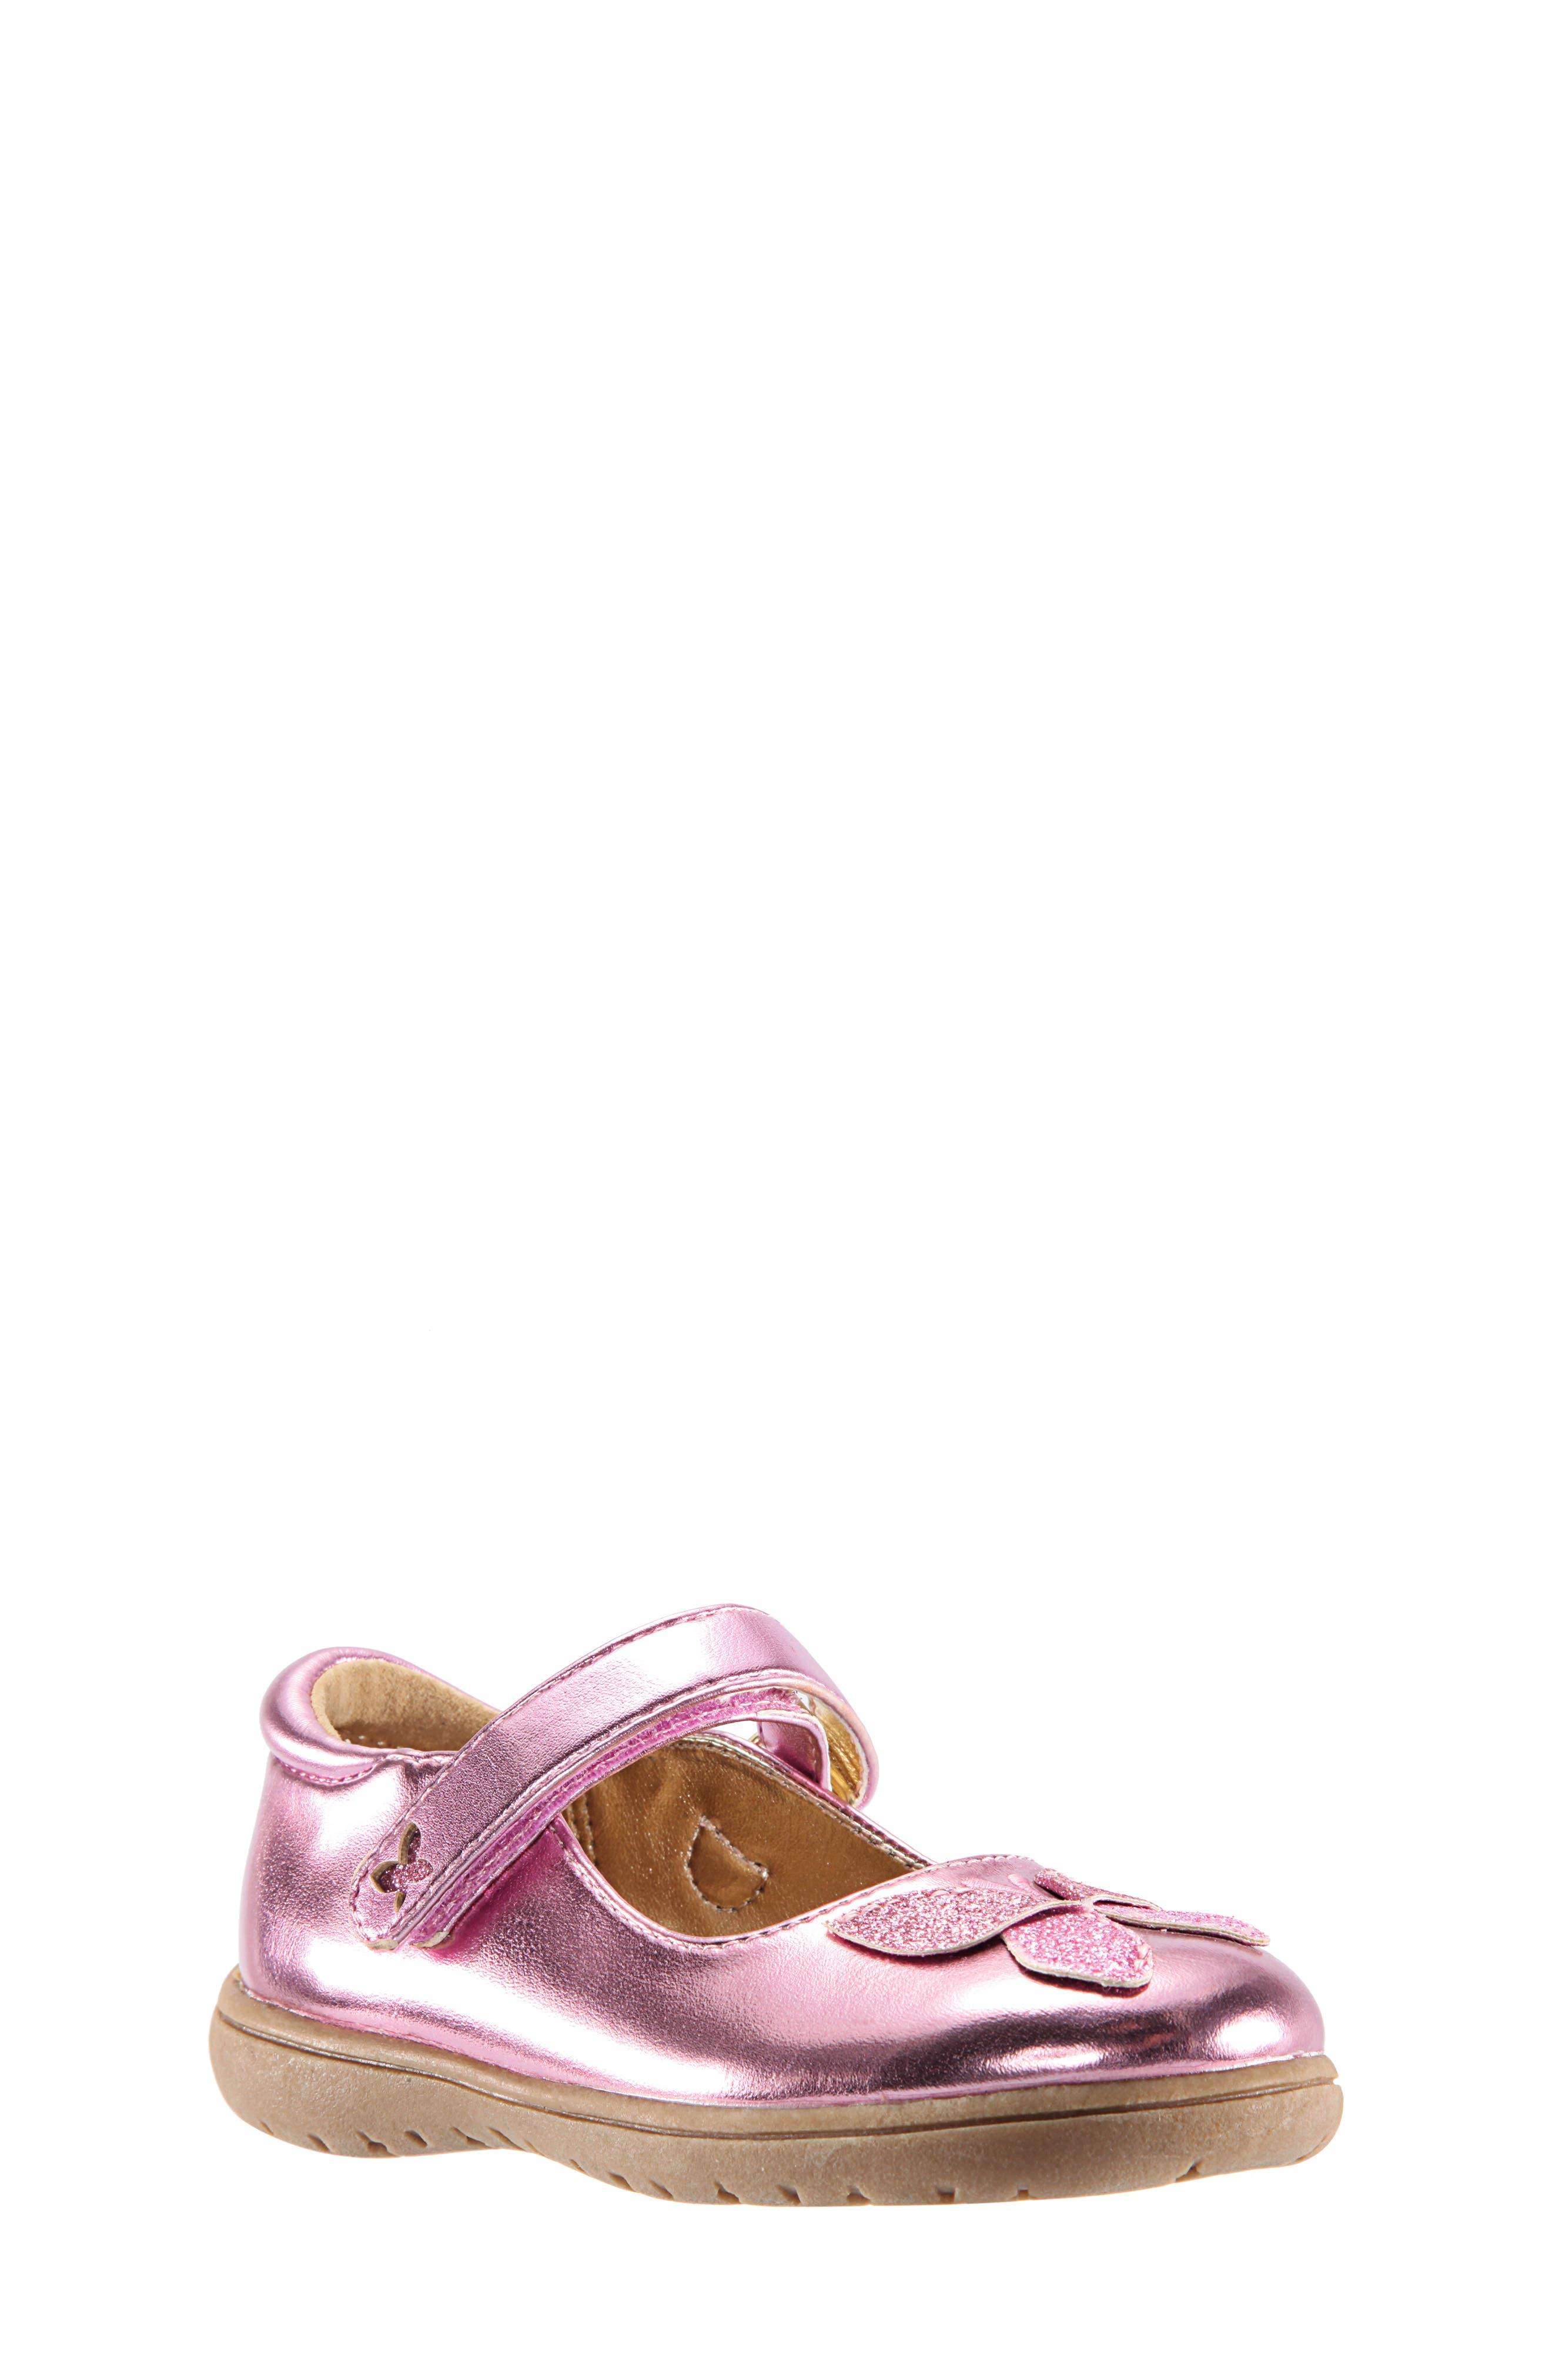 Alysha Glitter Mary Jane,                         Main,                         color, PINK/ SMOOTH GLITTER